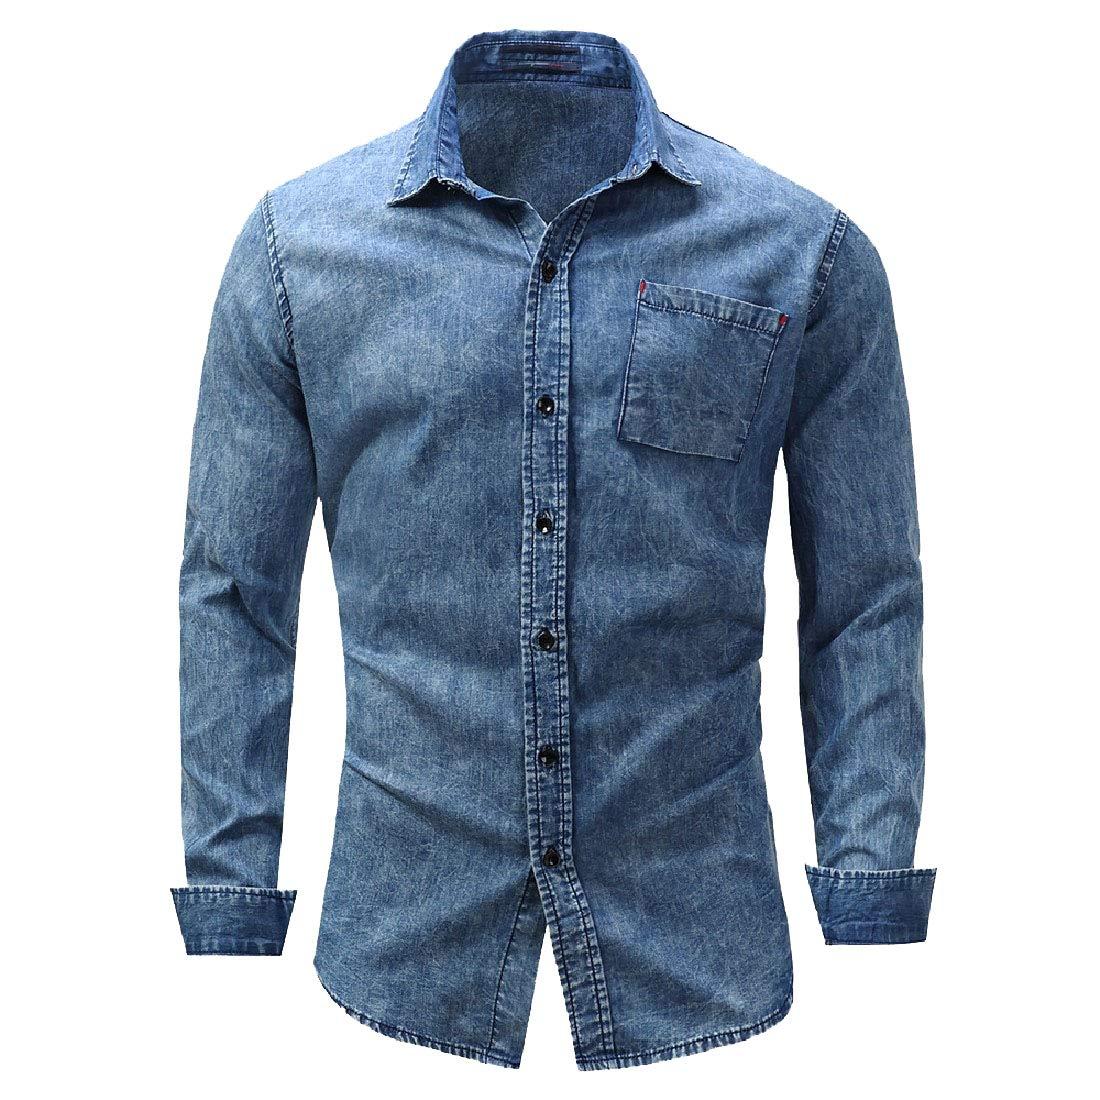 SportsX Mens Flat Collar Denim Cotton Long Sleeve Leisure Western Shirt